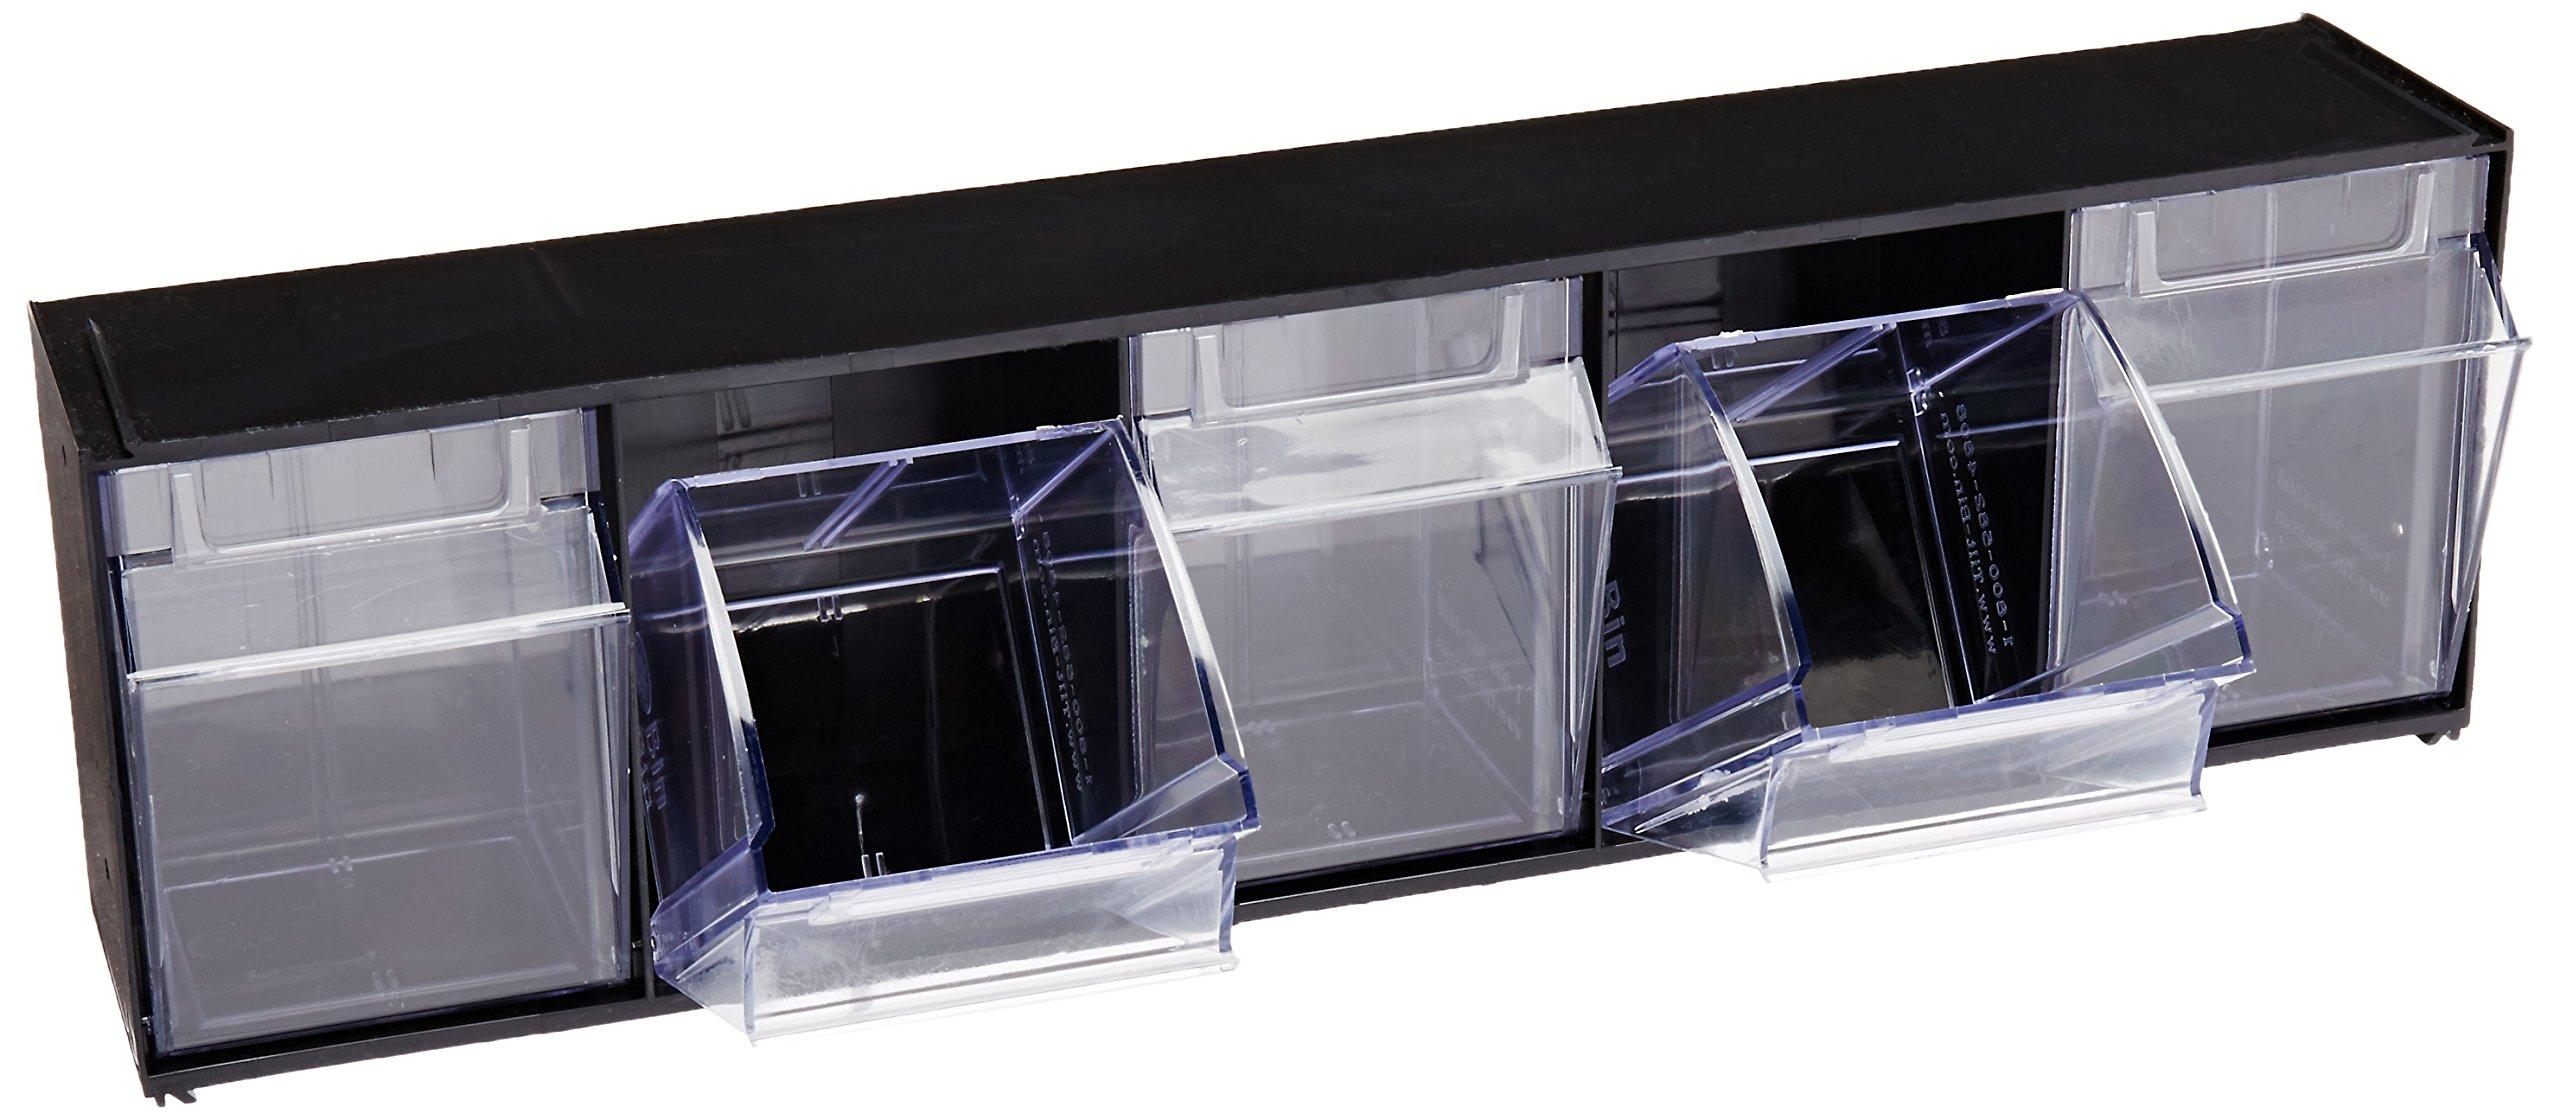 Deflecto 20504OP Five-bin horizontal tilt bin storage system, 23-5/8w x 5-1/4d x 6-1/2h, black